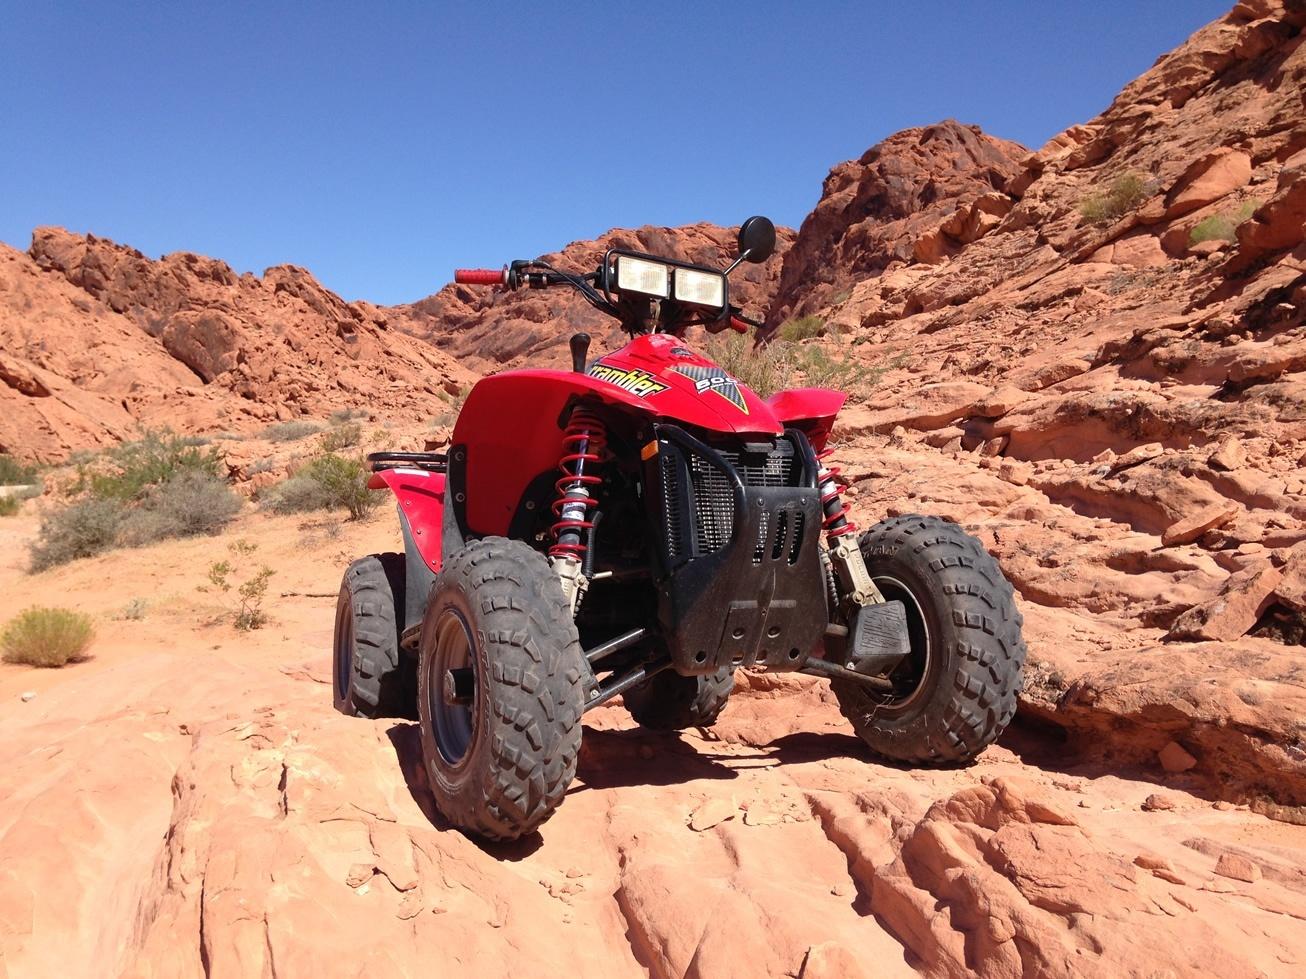 ATV en quad rijden op de Logandale Trails, NV